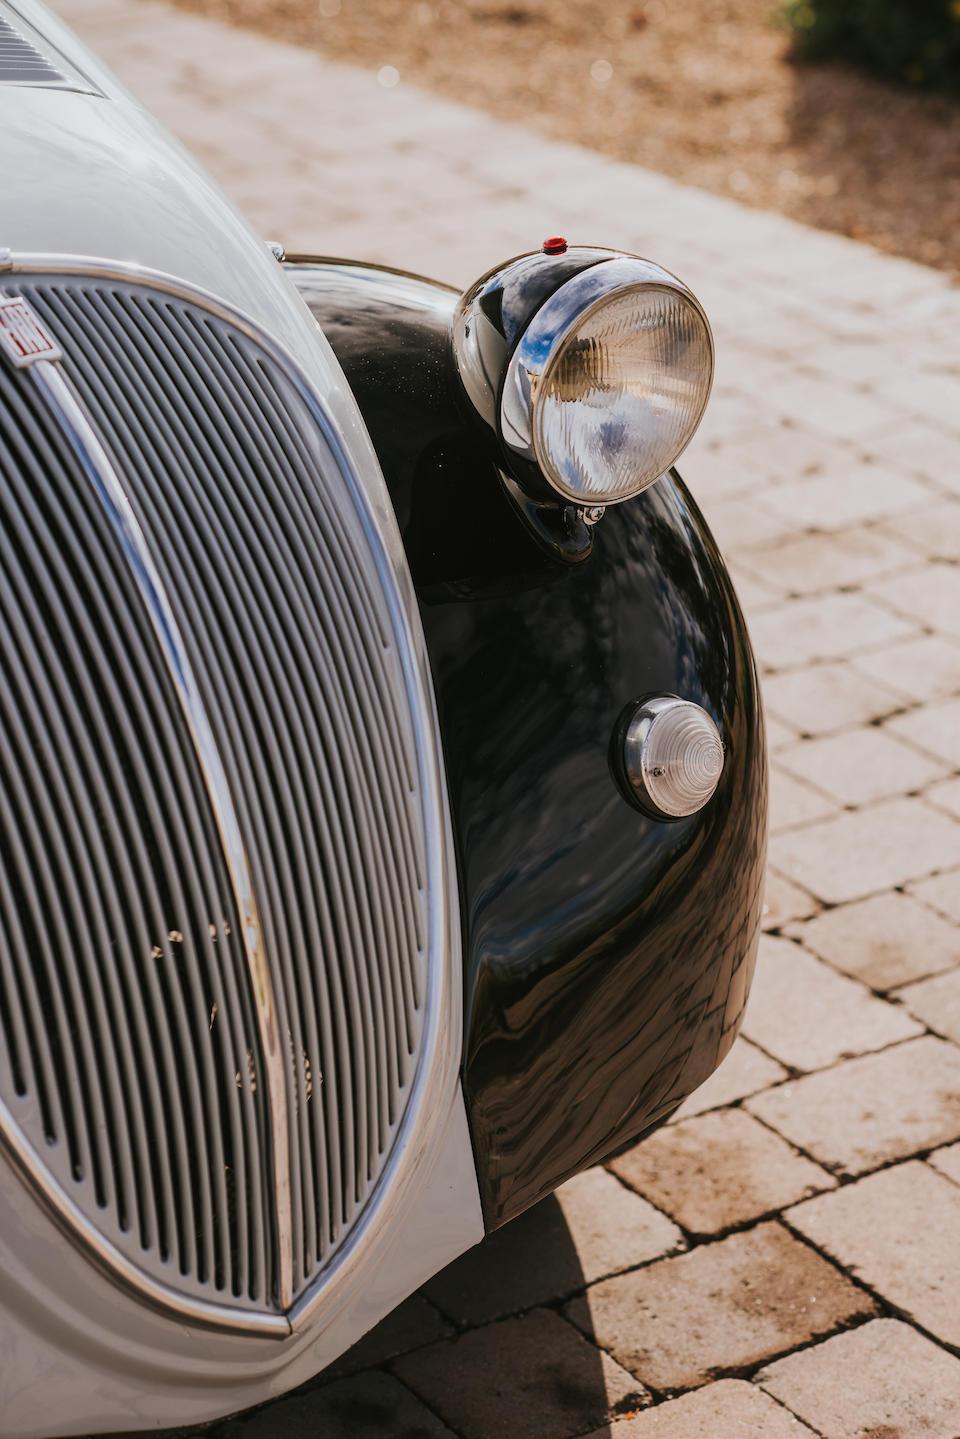 <b>1948 Fiat 500B Topolino Cabriolet</b><br />Chassis no. 500B131699<br />Engine no. 500B134881